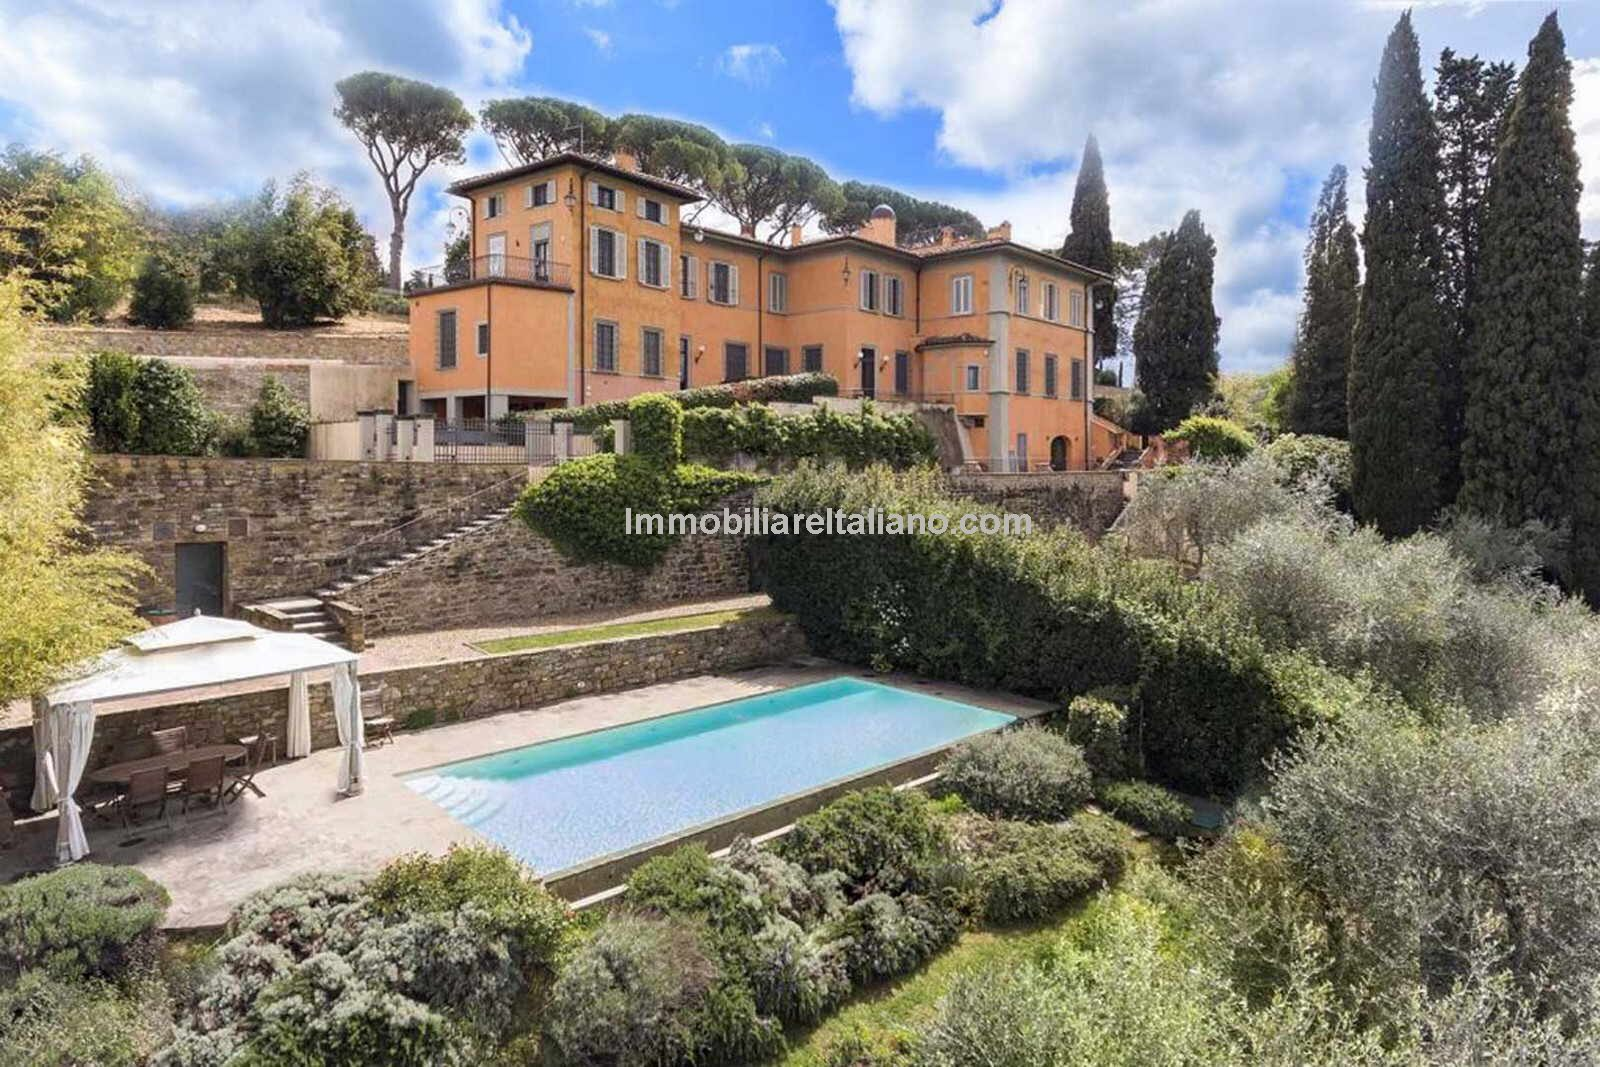 Florence villa and pool